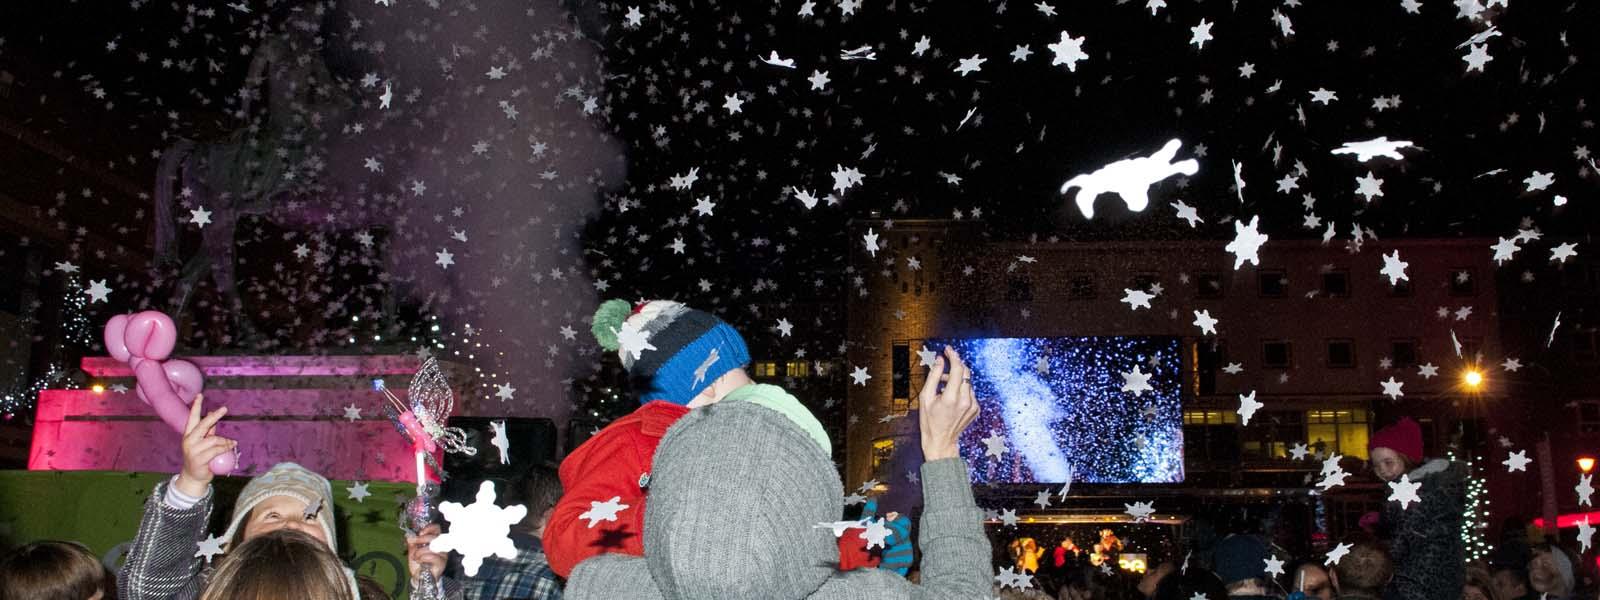 Slider Coventry Christmas Lights white snowflake confetti